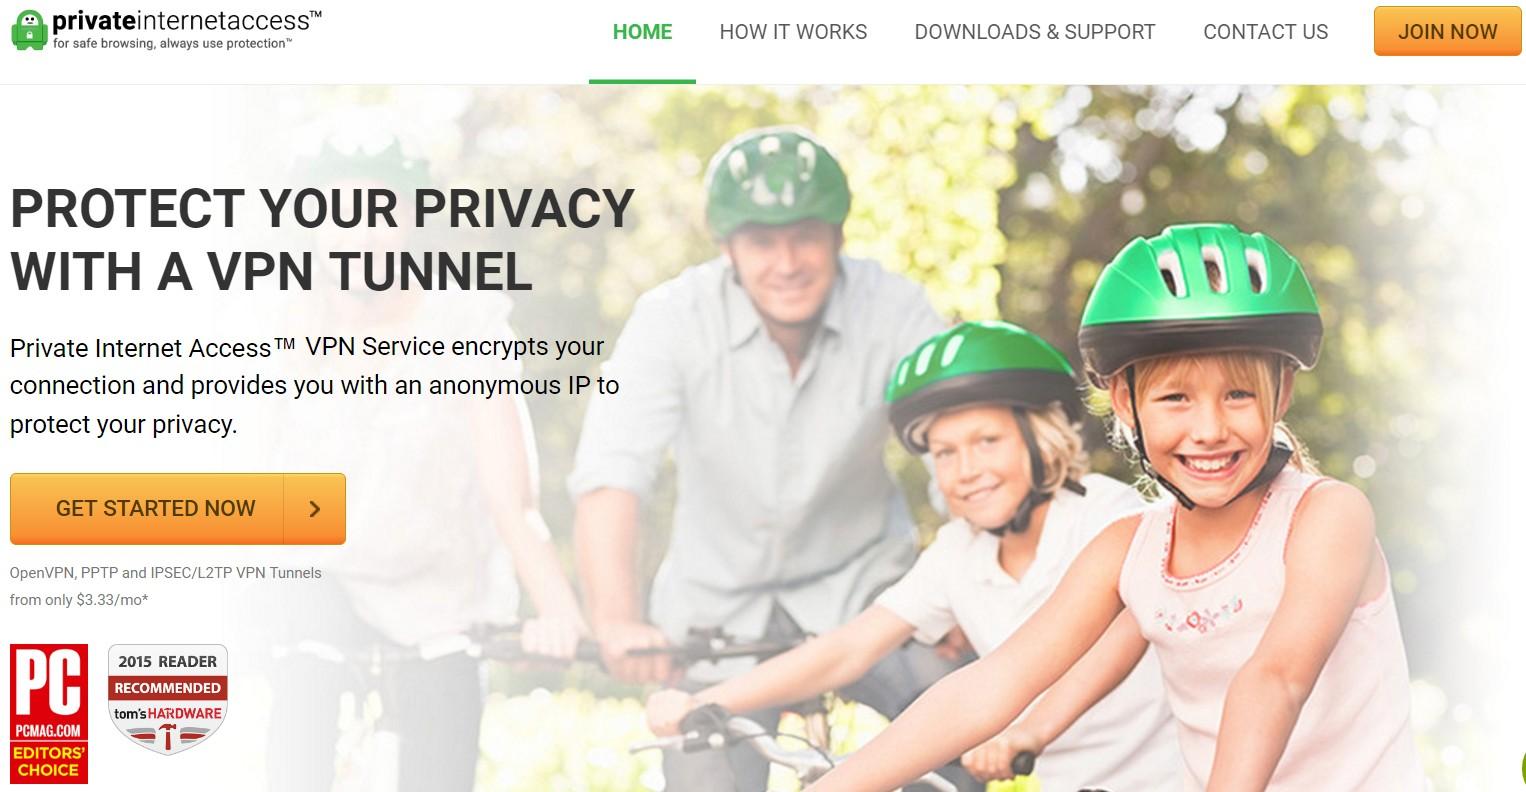 Private Internet Access - PIA - Home Page